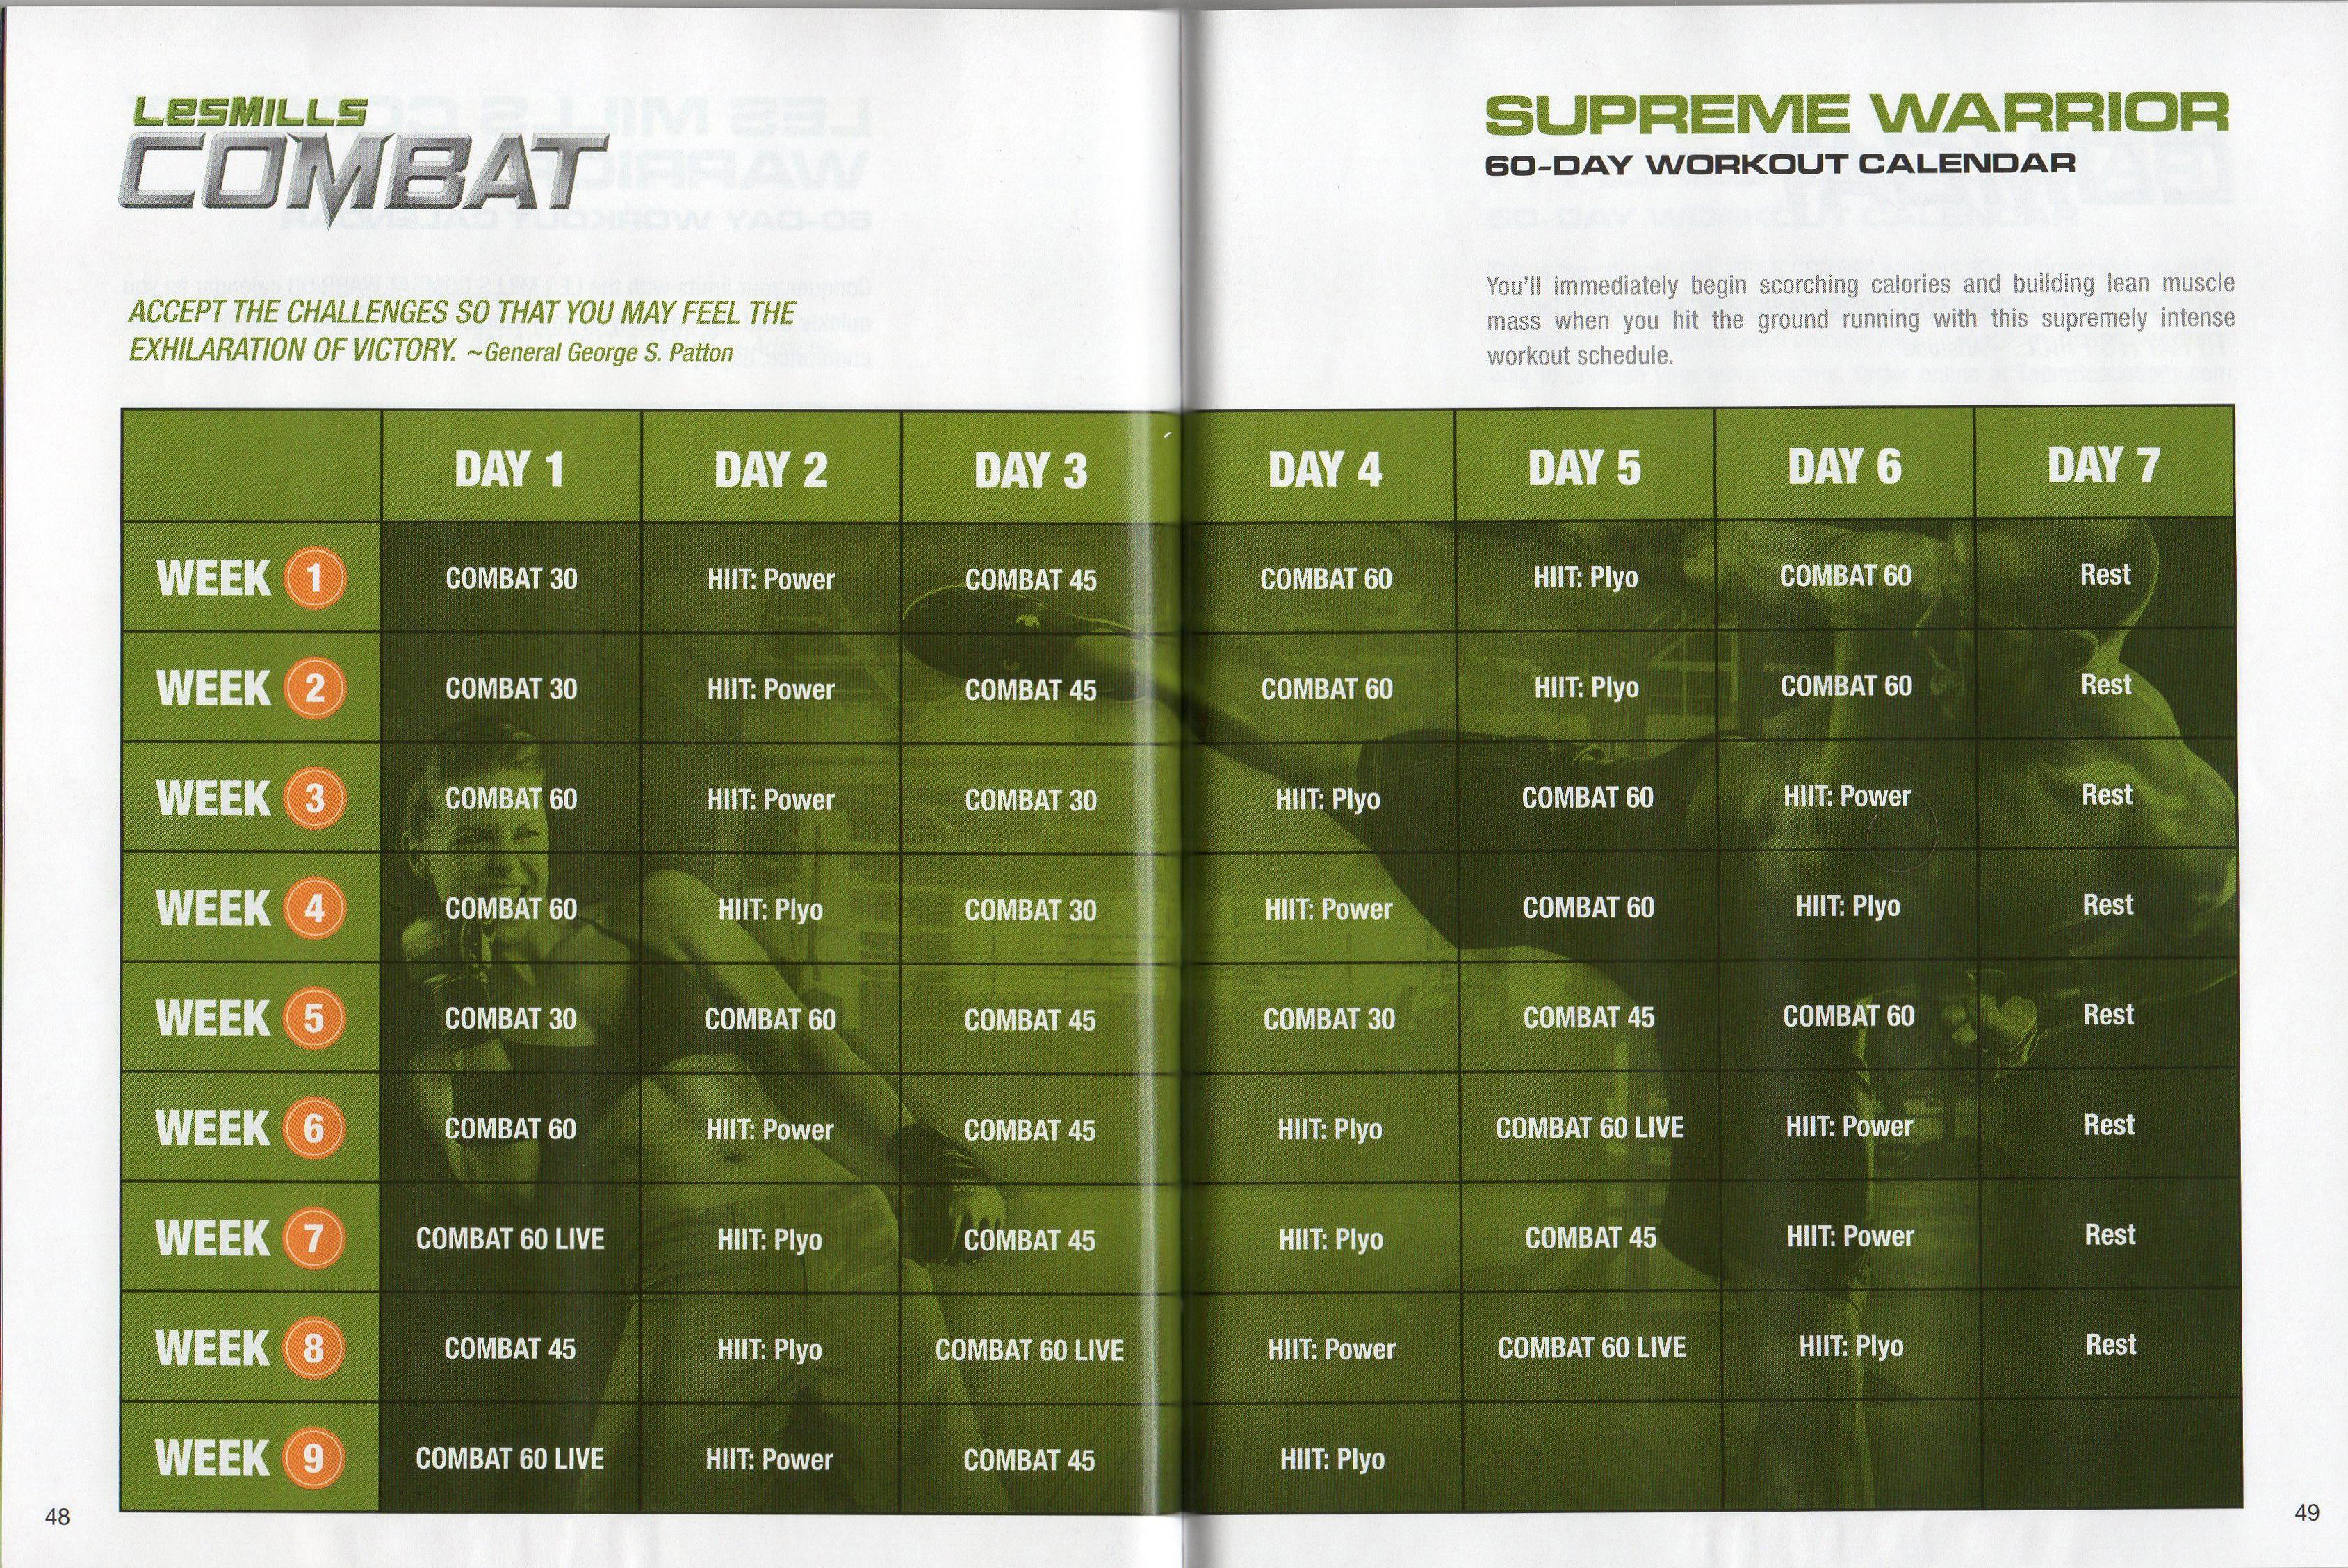 Les Mills Combat ~ 02 ~ 60 Day Supreme Warrior Calendar